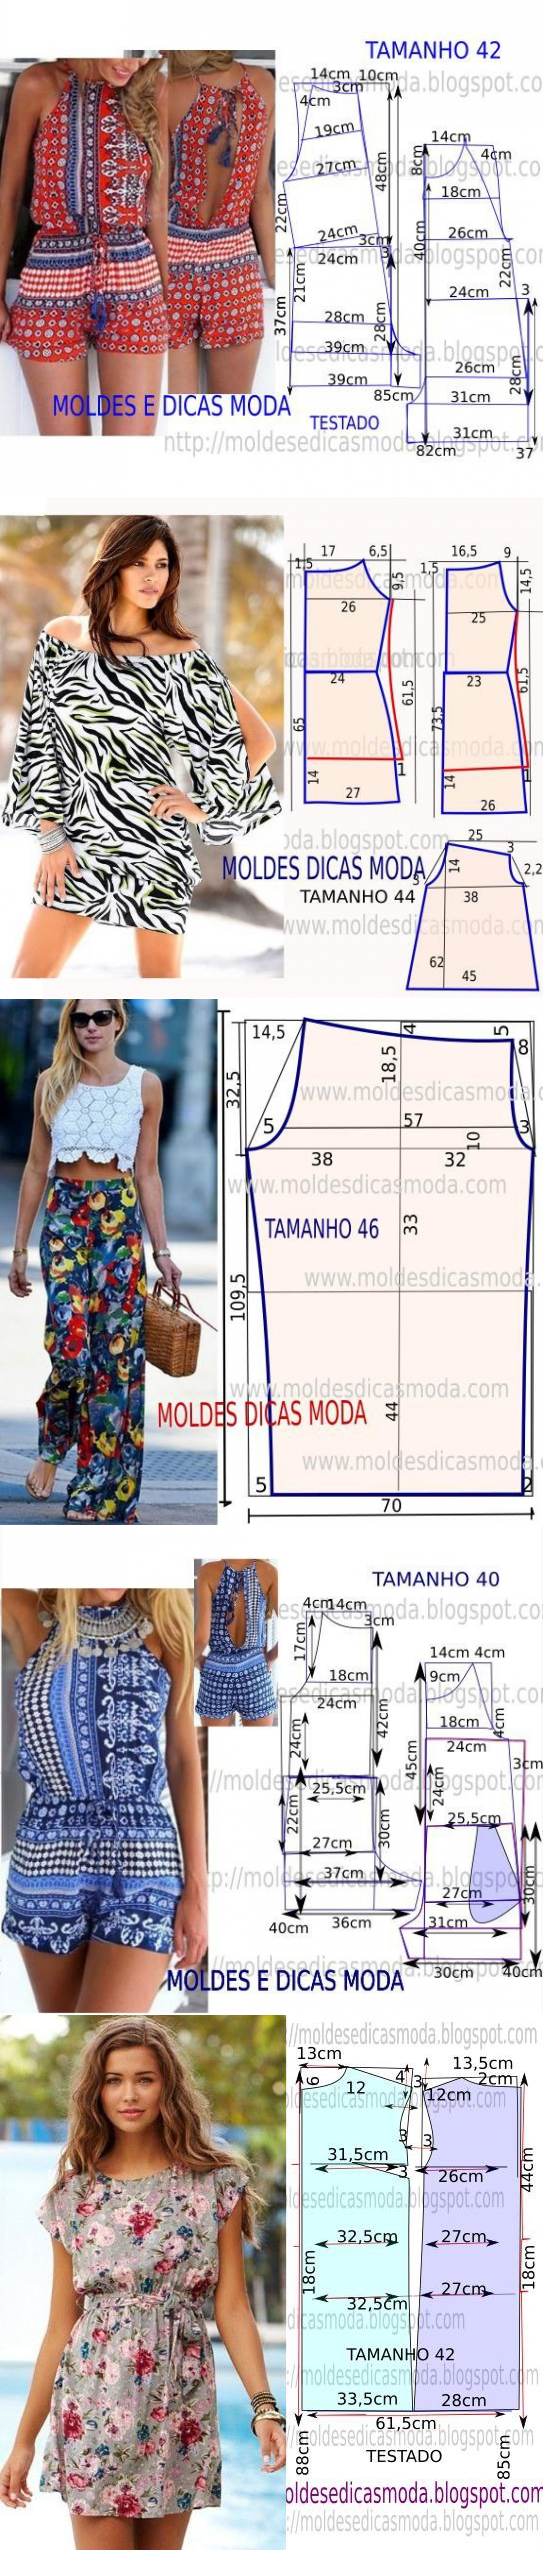 uyttera.ru | Moldes | Pinterest | Costura, Ropa y Vestidos